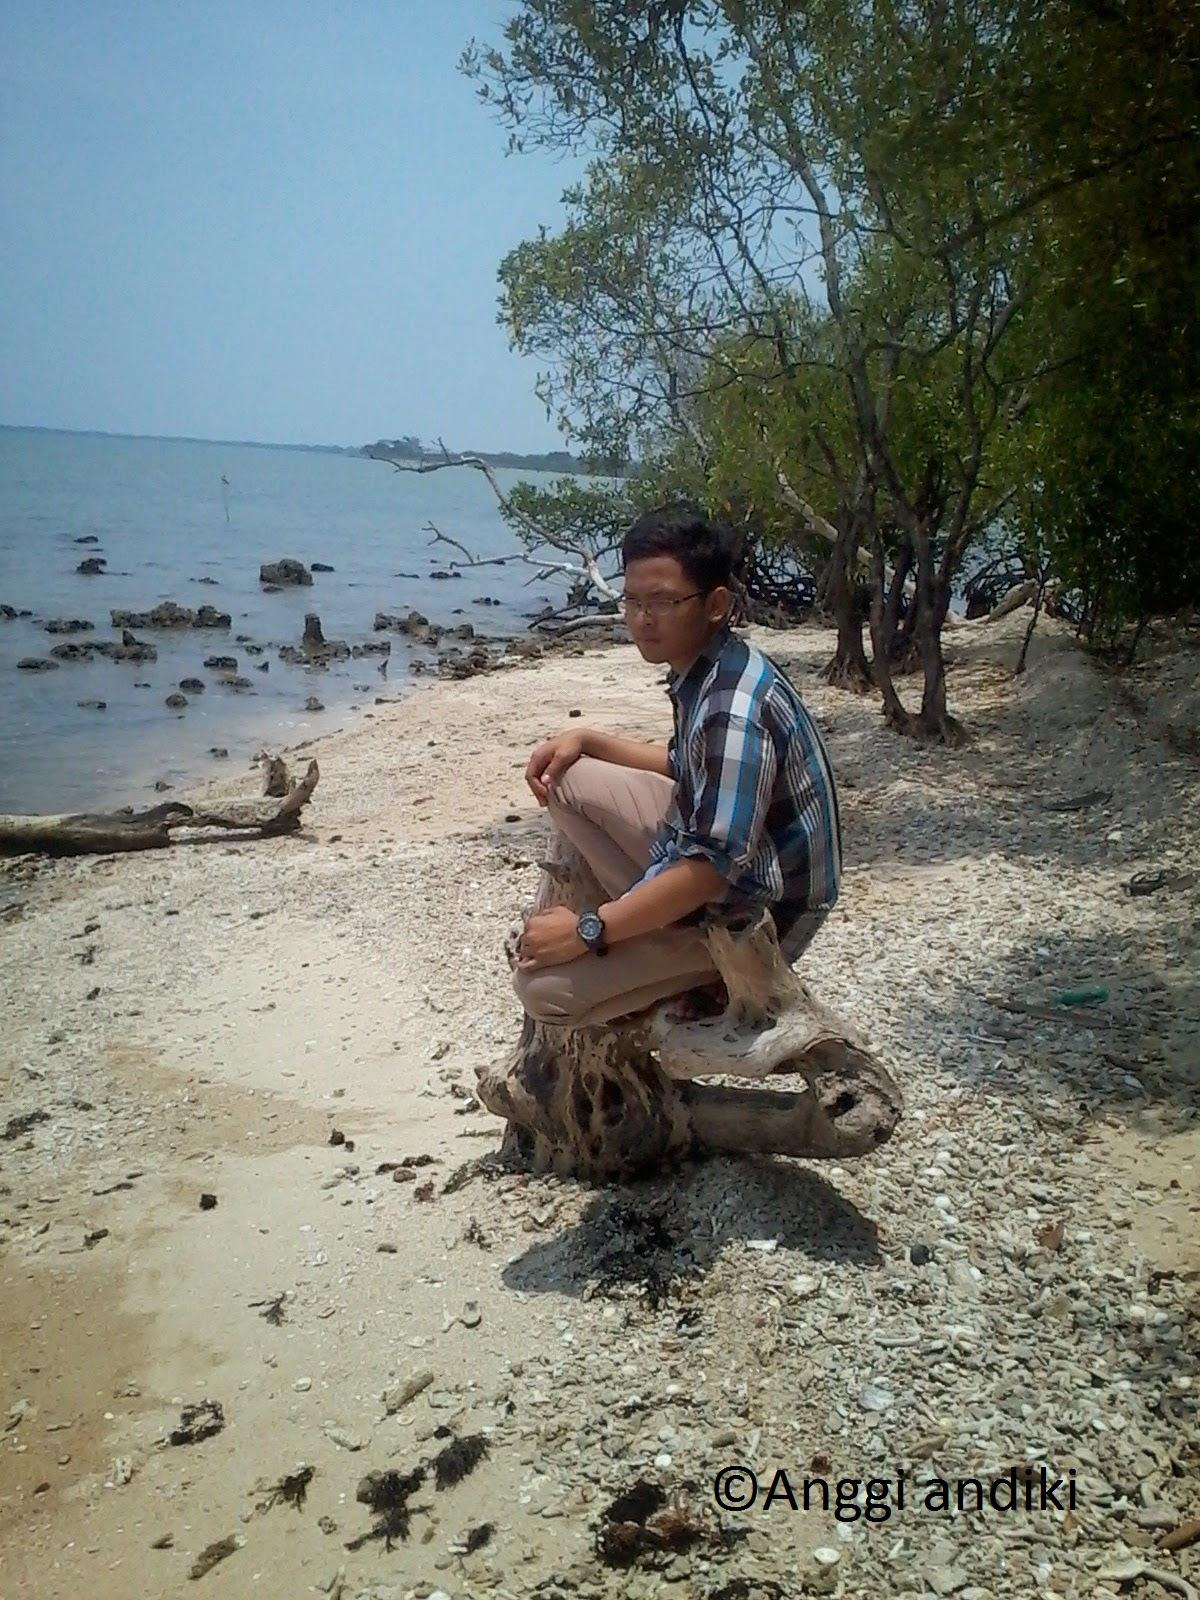 Wisata Cagar Alam Pulau Dua Serang Banten Daily Life Blog Internet Marketing